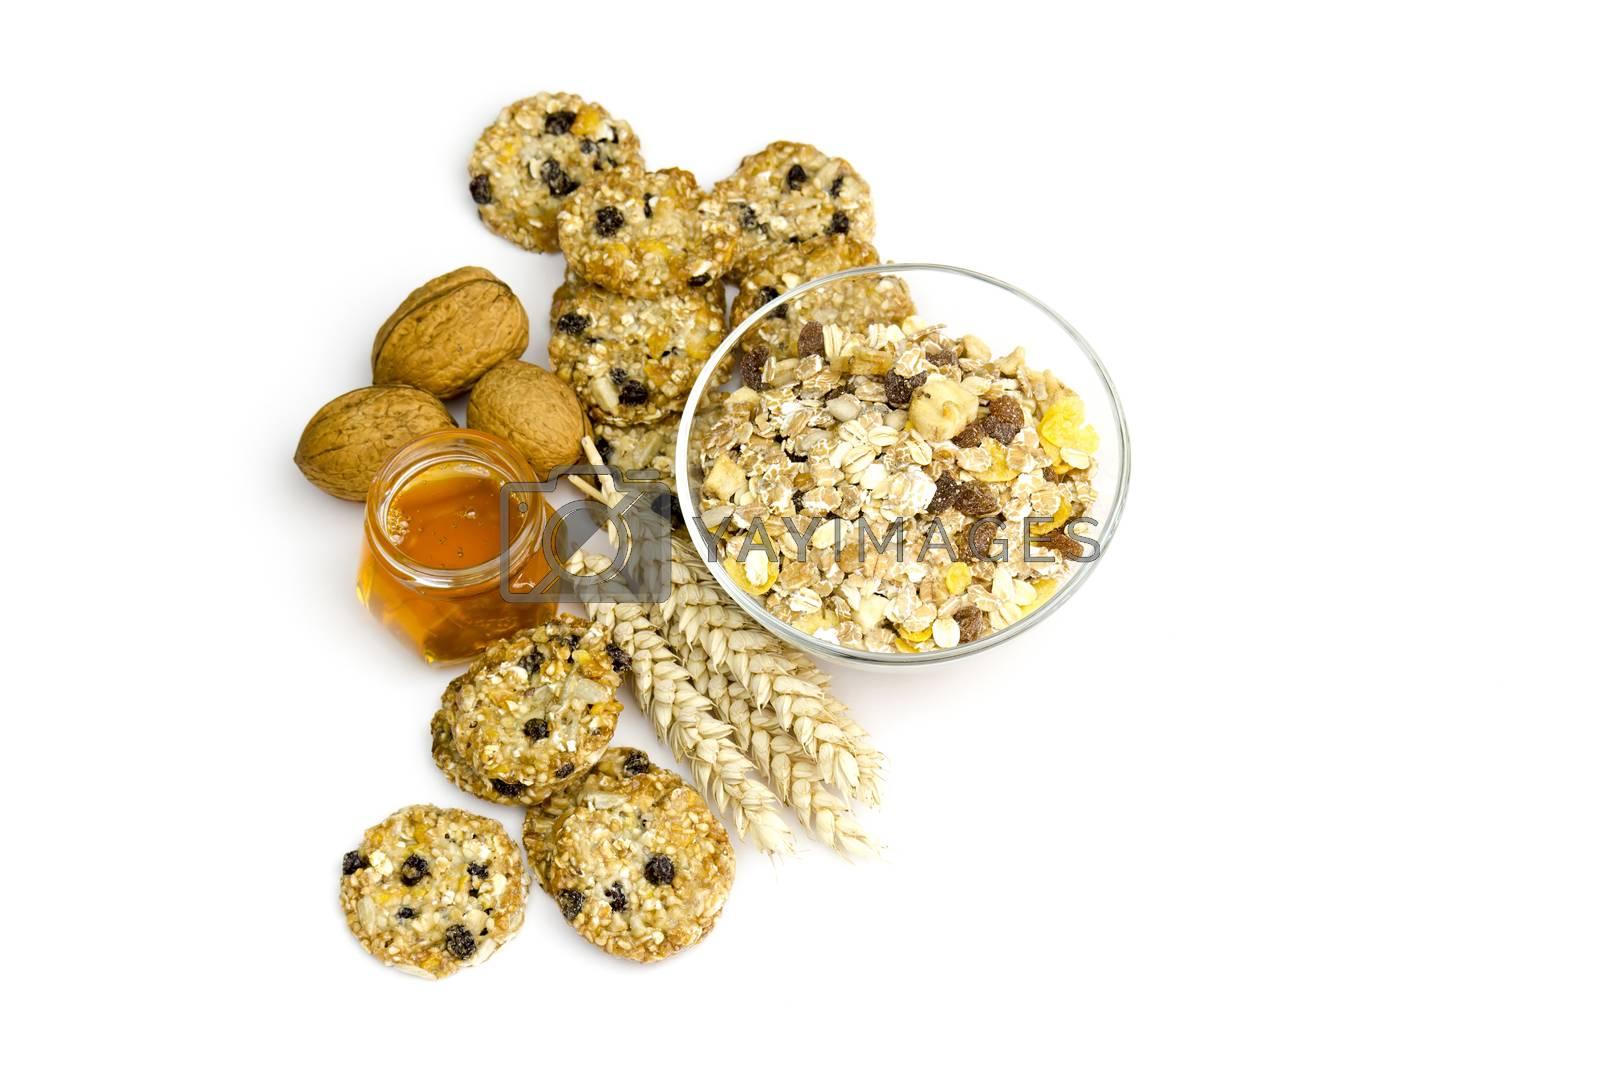 cereal cookies, muesli, honey and nuts